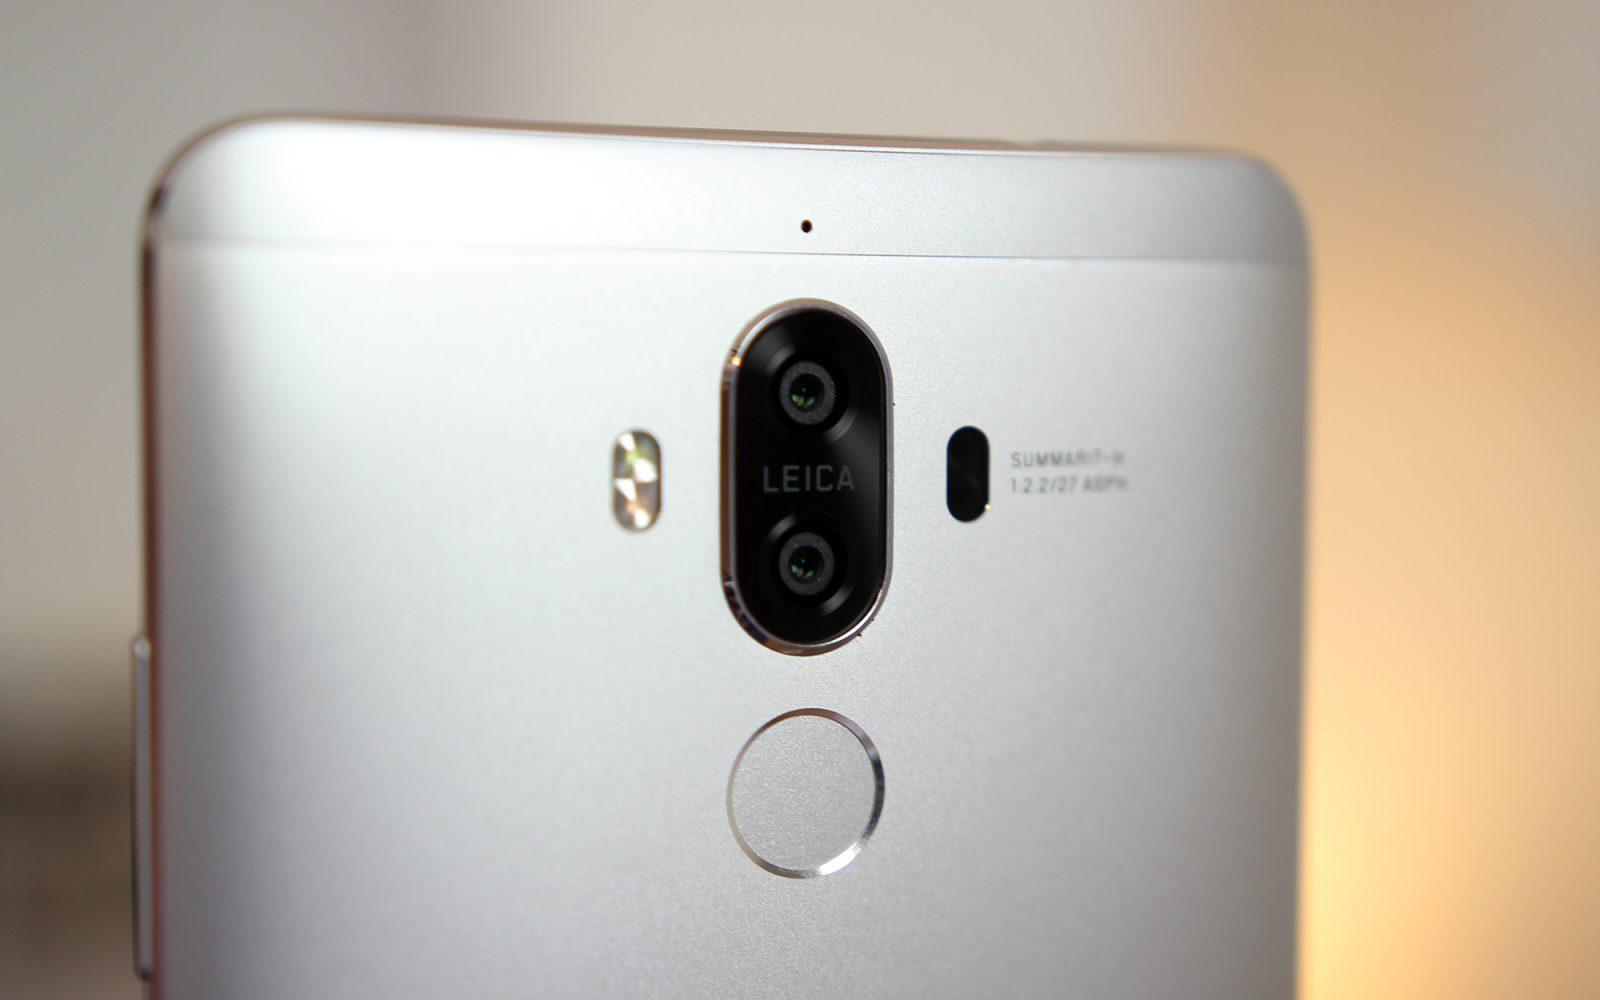 Huawei Mate 9 is the first phone w/ Amazon Alexa pre